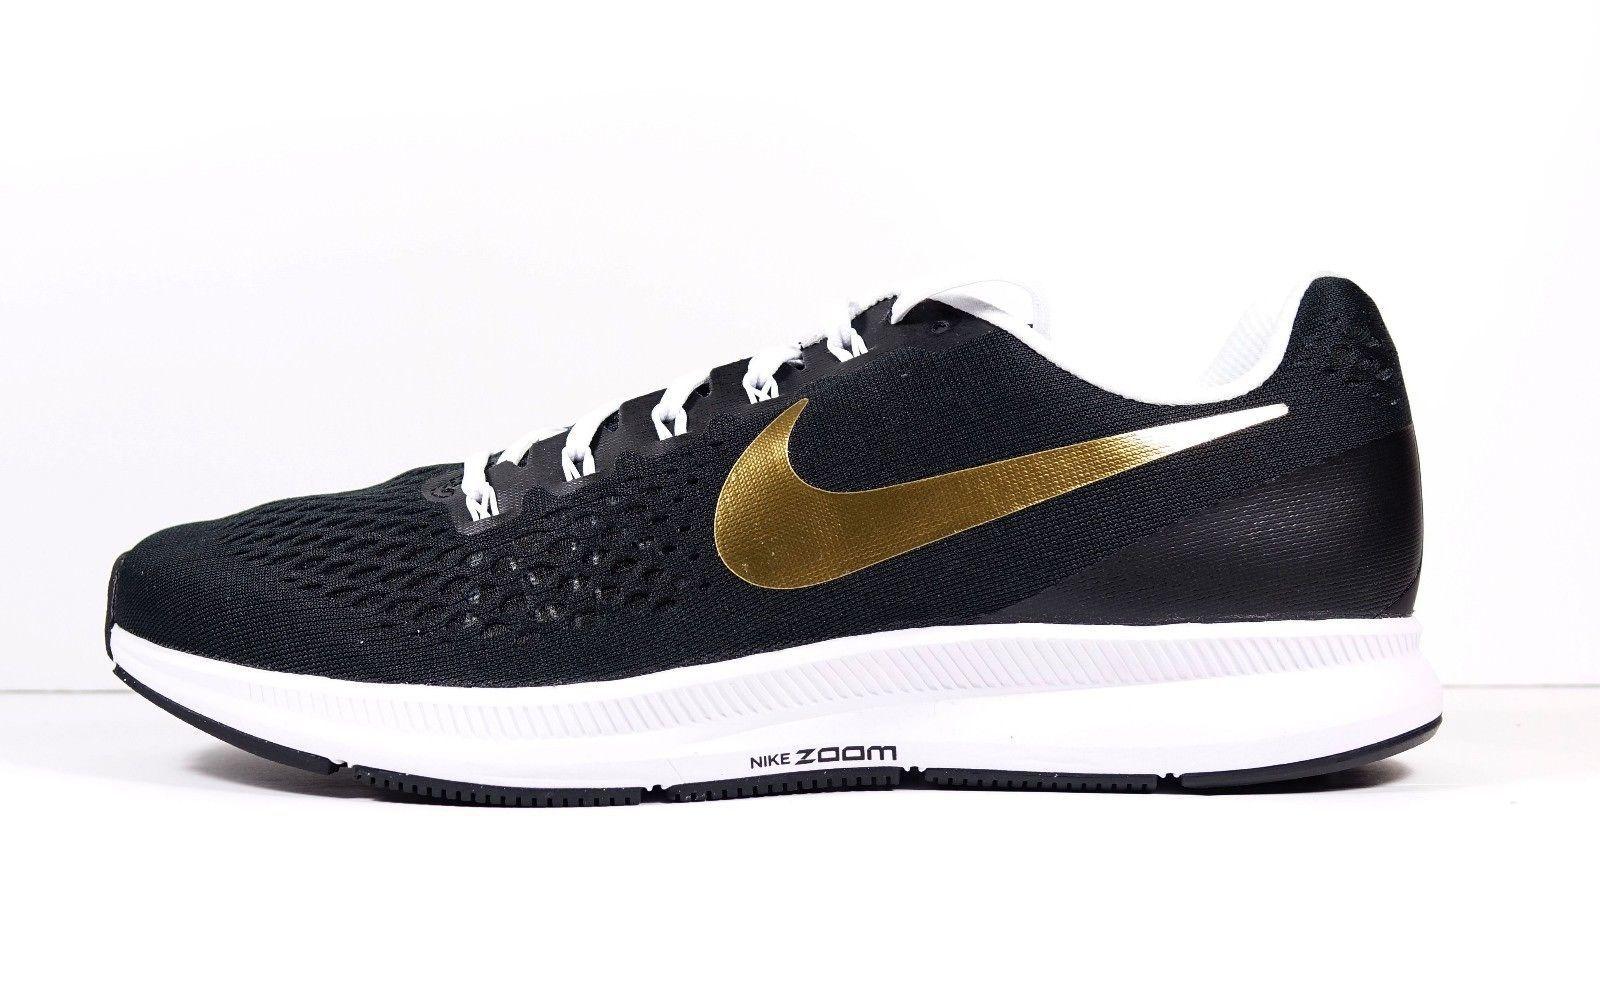 Nike Zoom Pegasus 34 iD Black Gold White and similar items